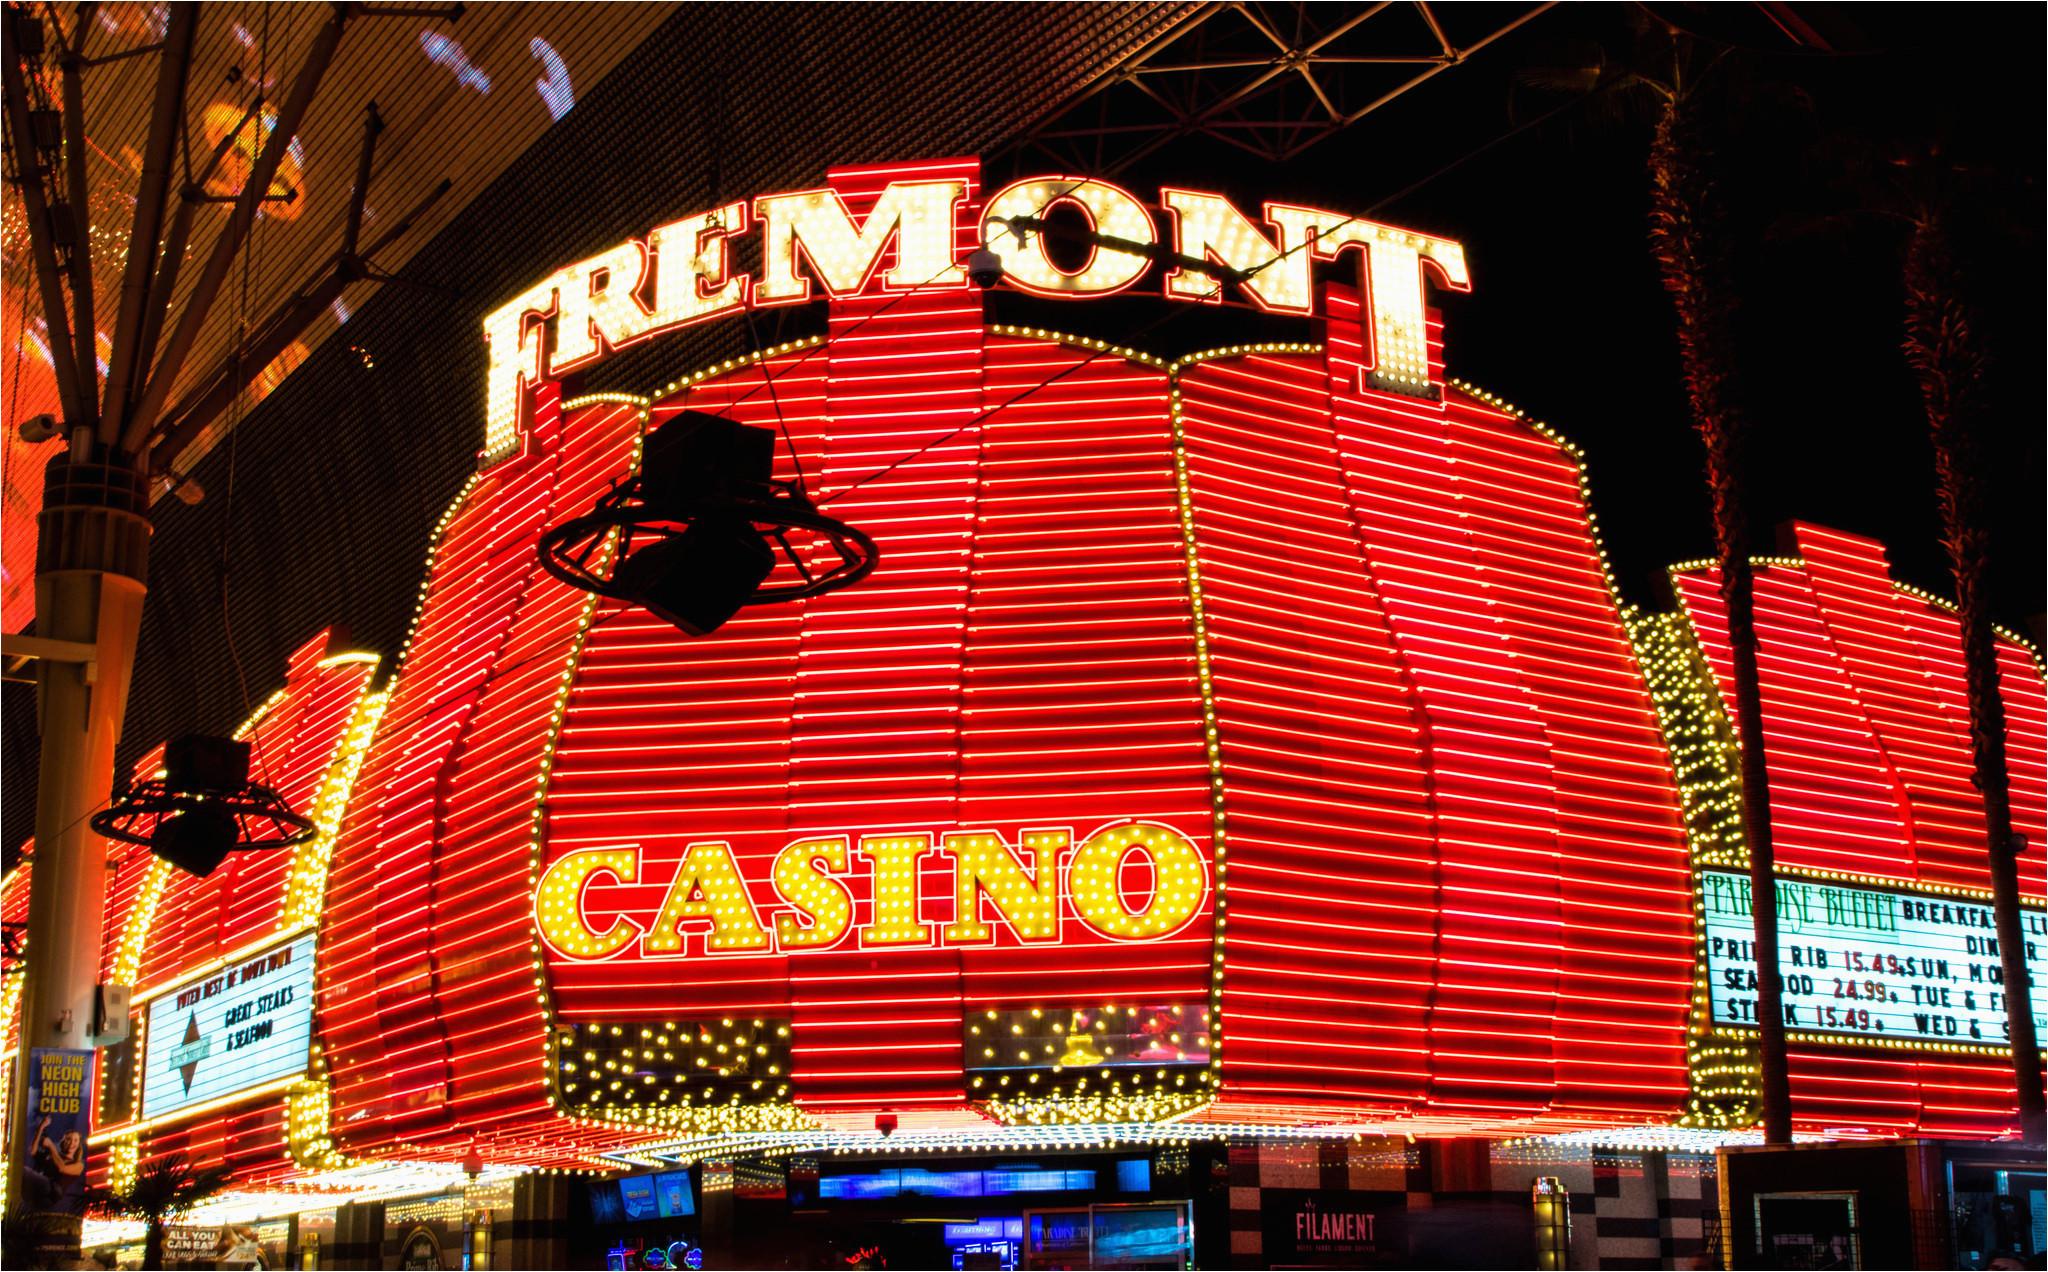 casinos southern california map ettcarworld com